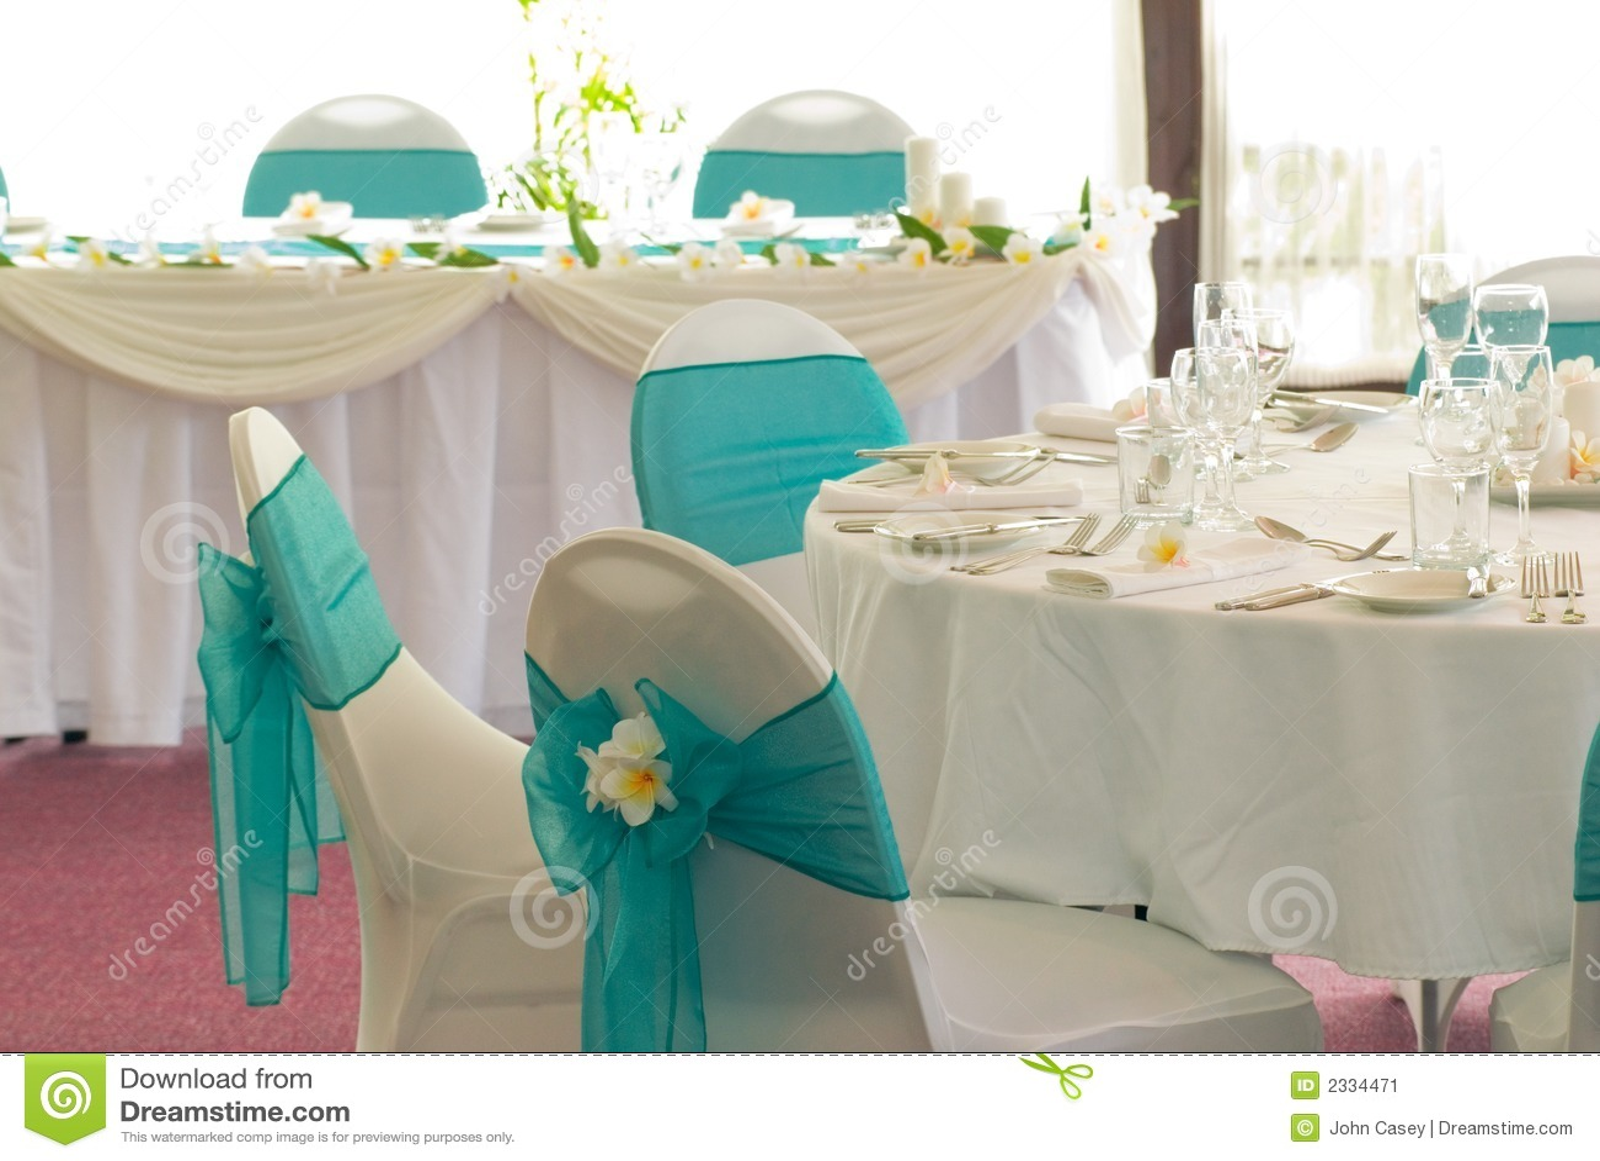 Wedding Reception Display Stock Image Image Of Glasses 2334471